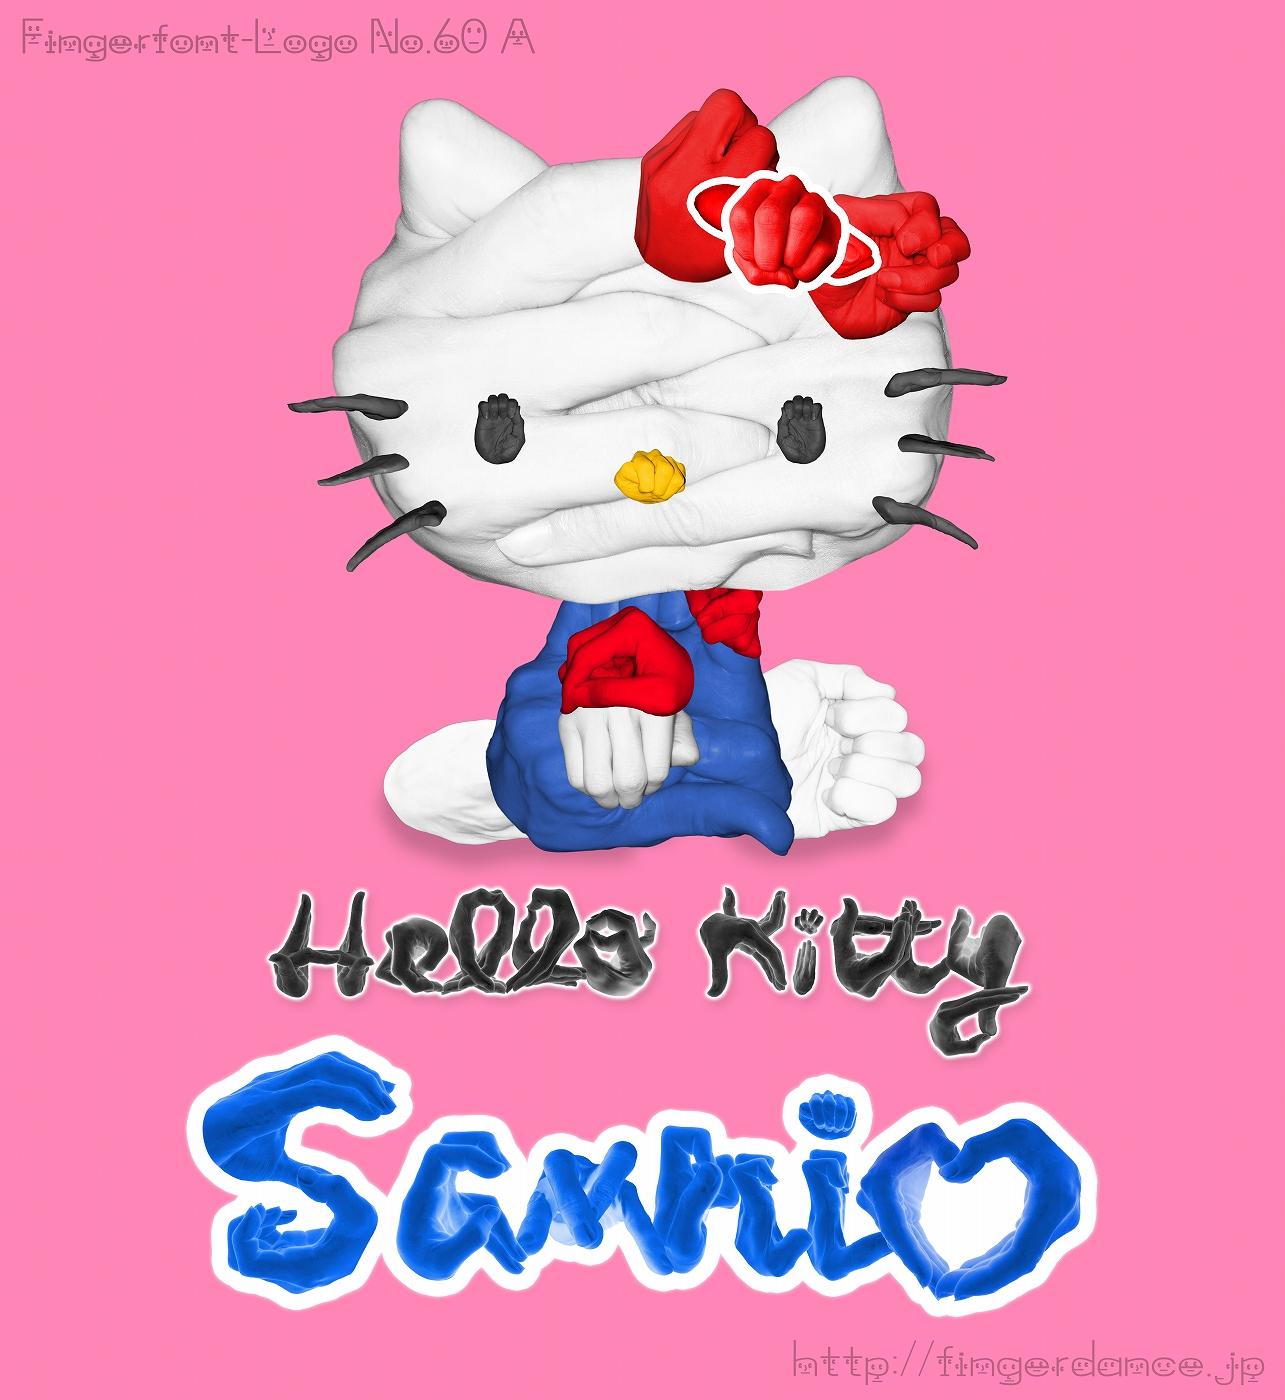 Sanrio-kity-fingerlogohand サンリオキティフィンガーロゴハンド手指